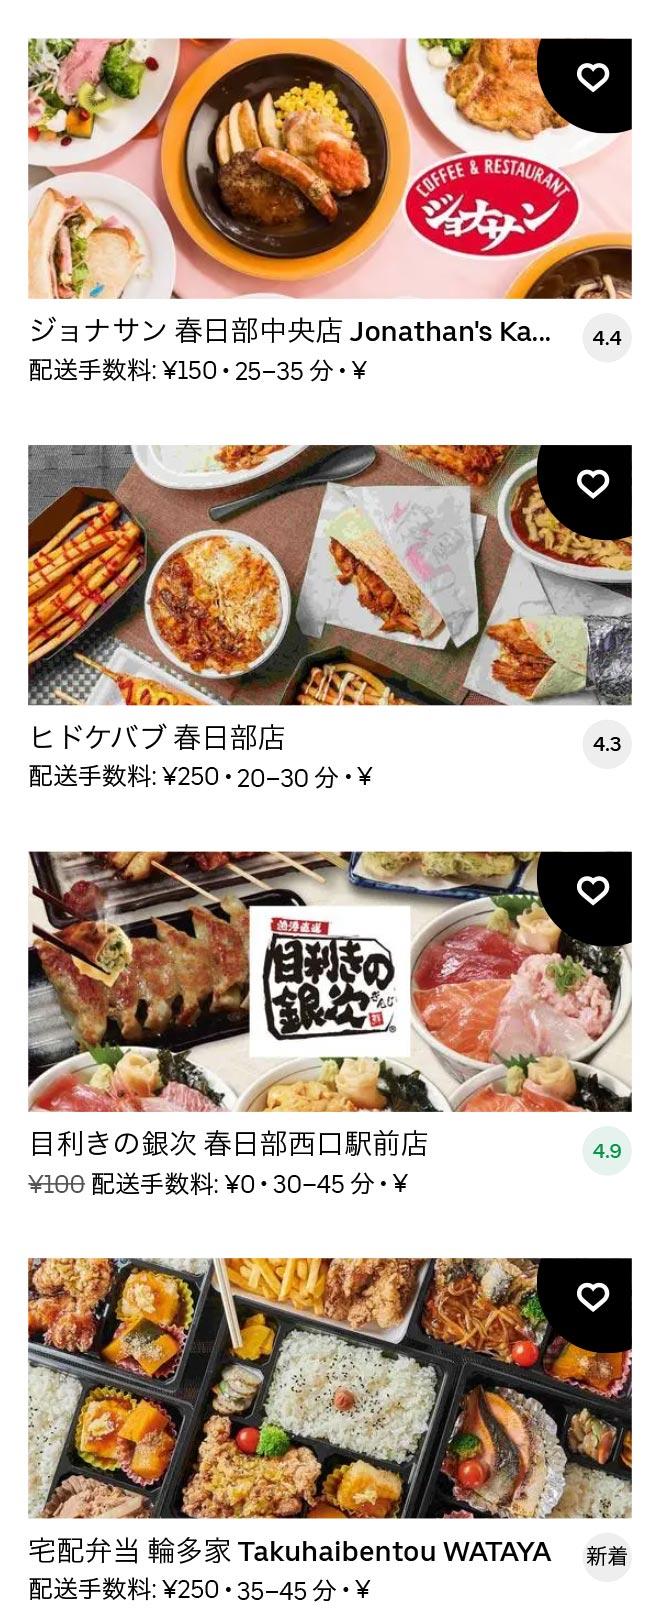 Kasukabe menu 2101 06